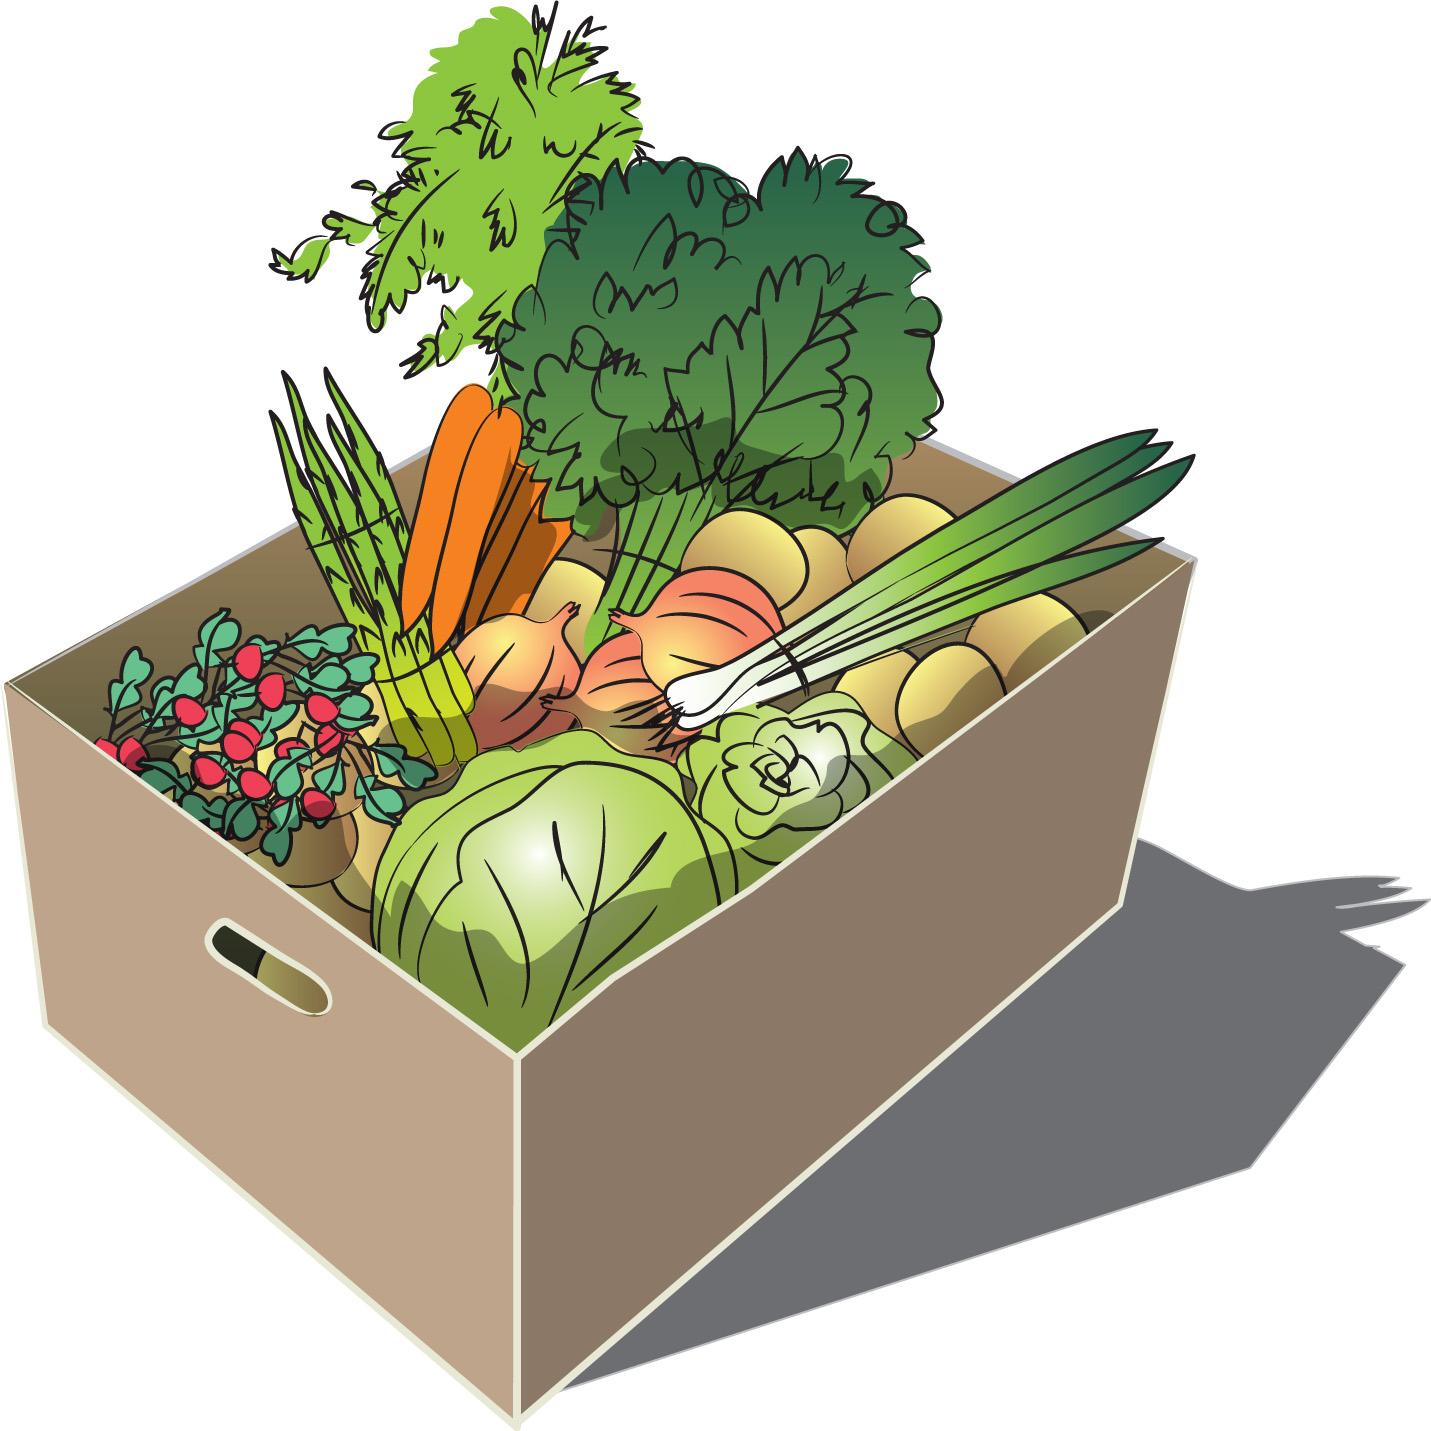 Large Spring vegetable share